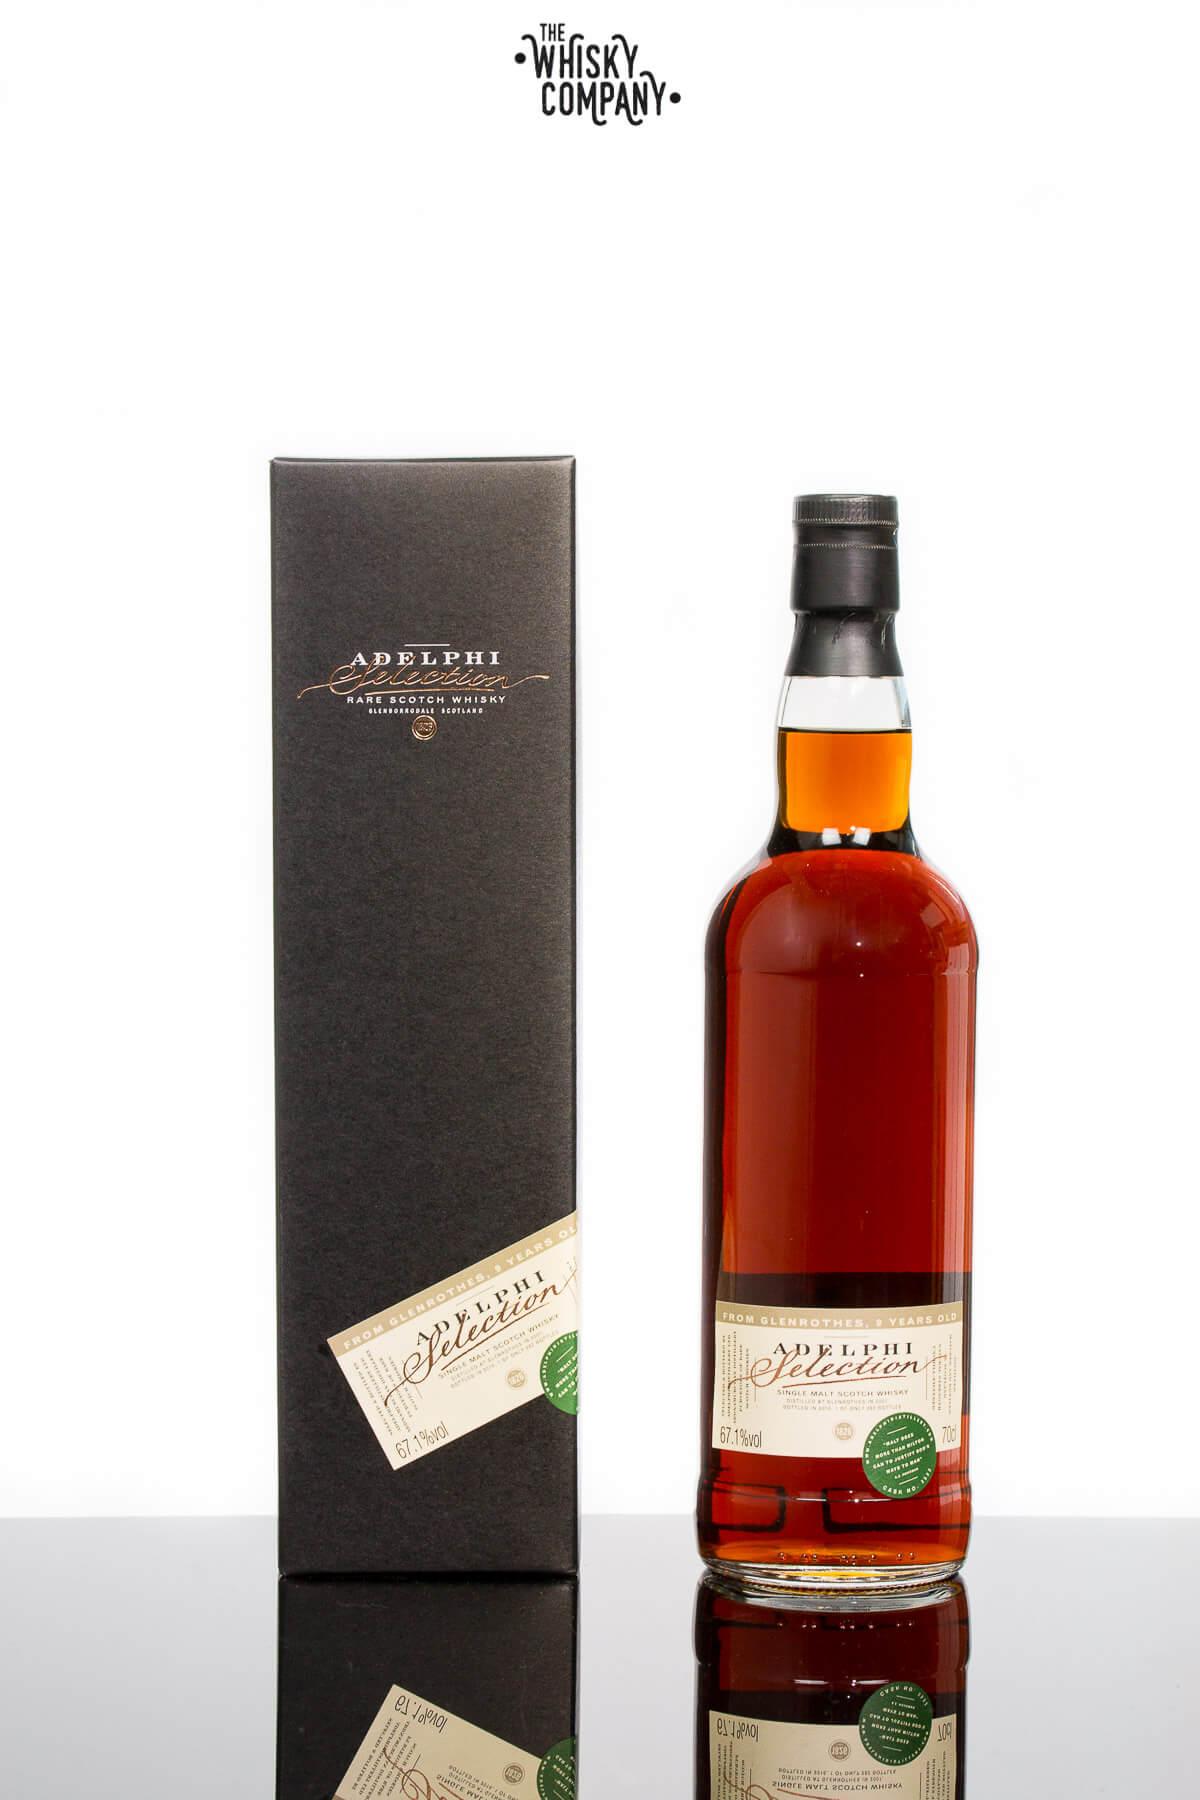 Adelphi 2007 Glenrothes 9 Years Old Speyside Single Malt Scotch Whisky (700ml)